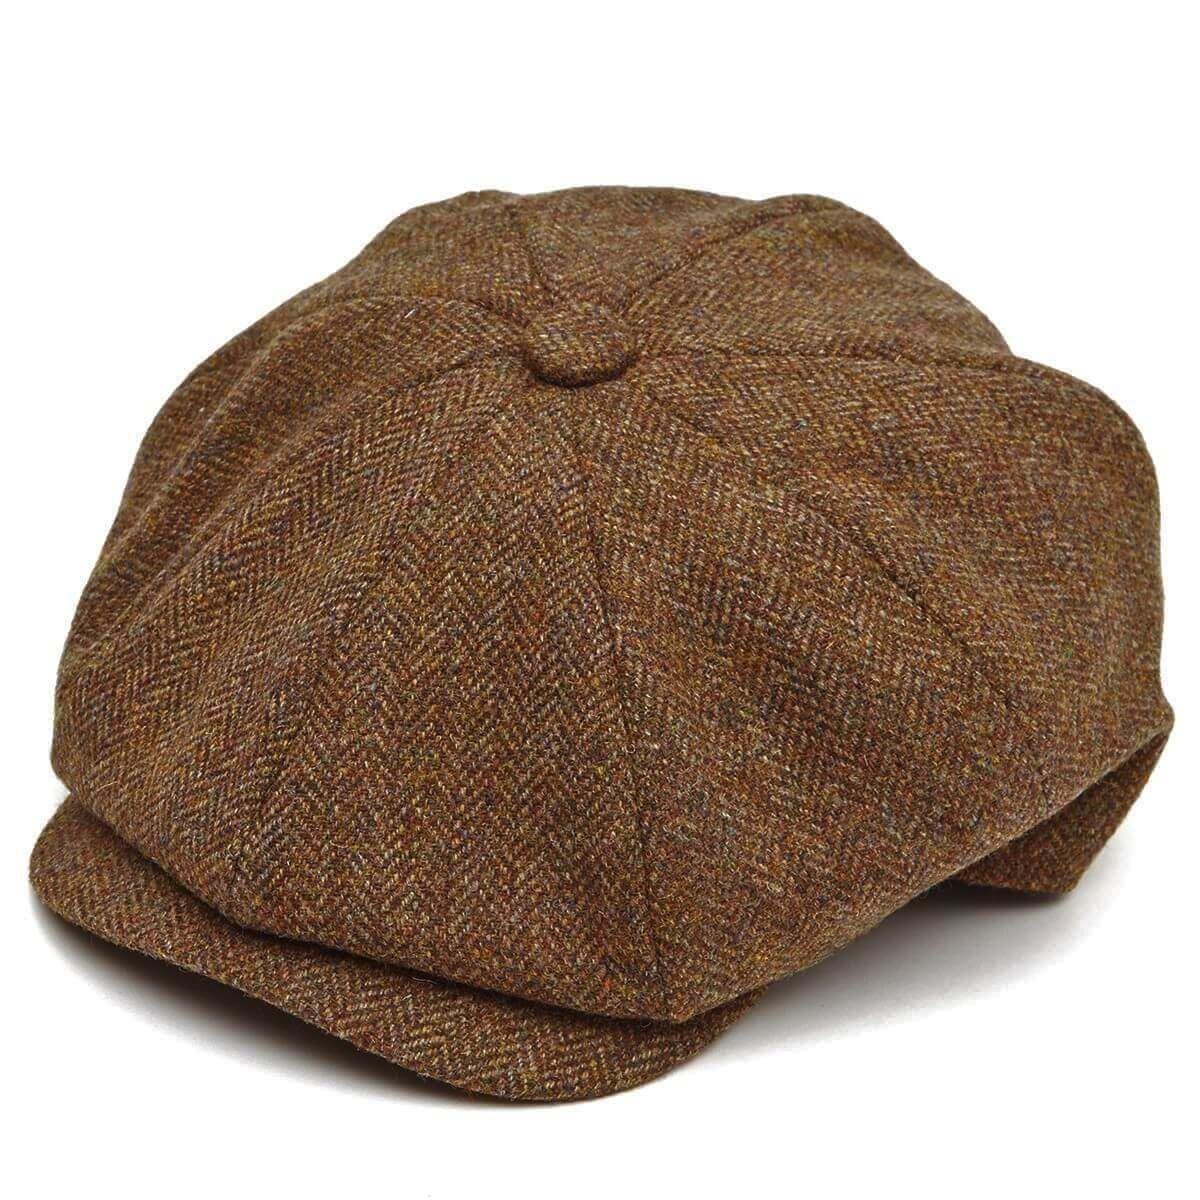 8 Piece Baker Boy Tweed Flat Cap Z524 Boys Flat Cap Flat Cap Cap